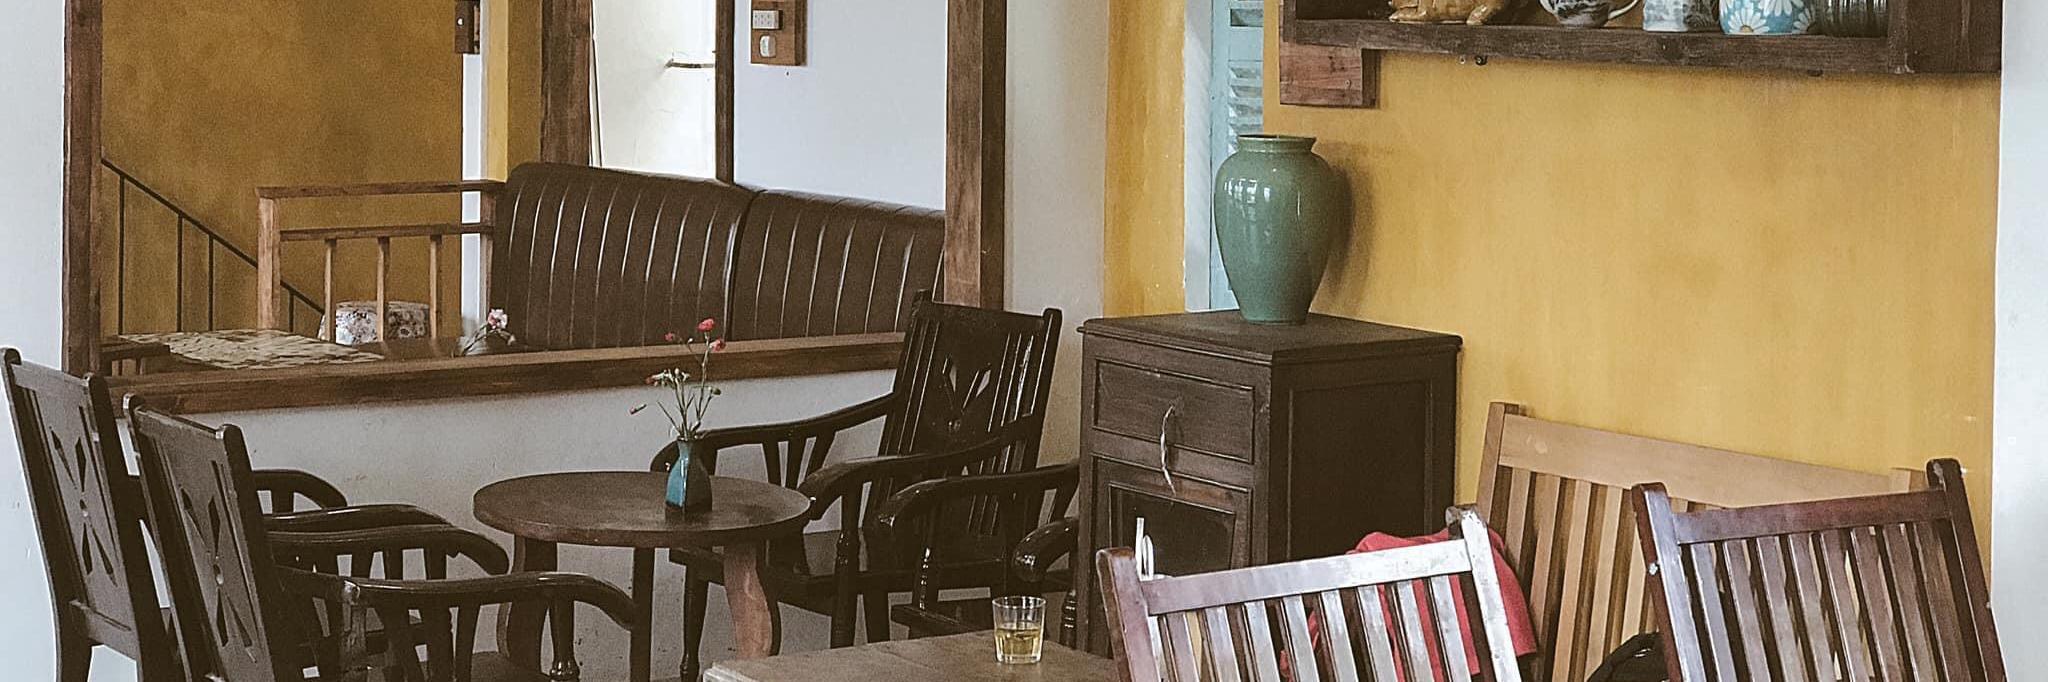 https://gody.vn/blog/congchua_mauhong803174/post/hoai-niem-mot-chut-voi-quan-ca-phe-vintage-o-quang-nam-8978